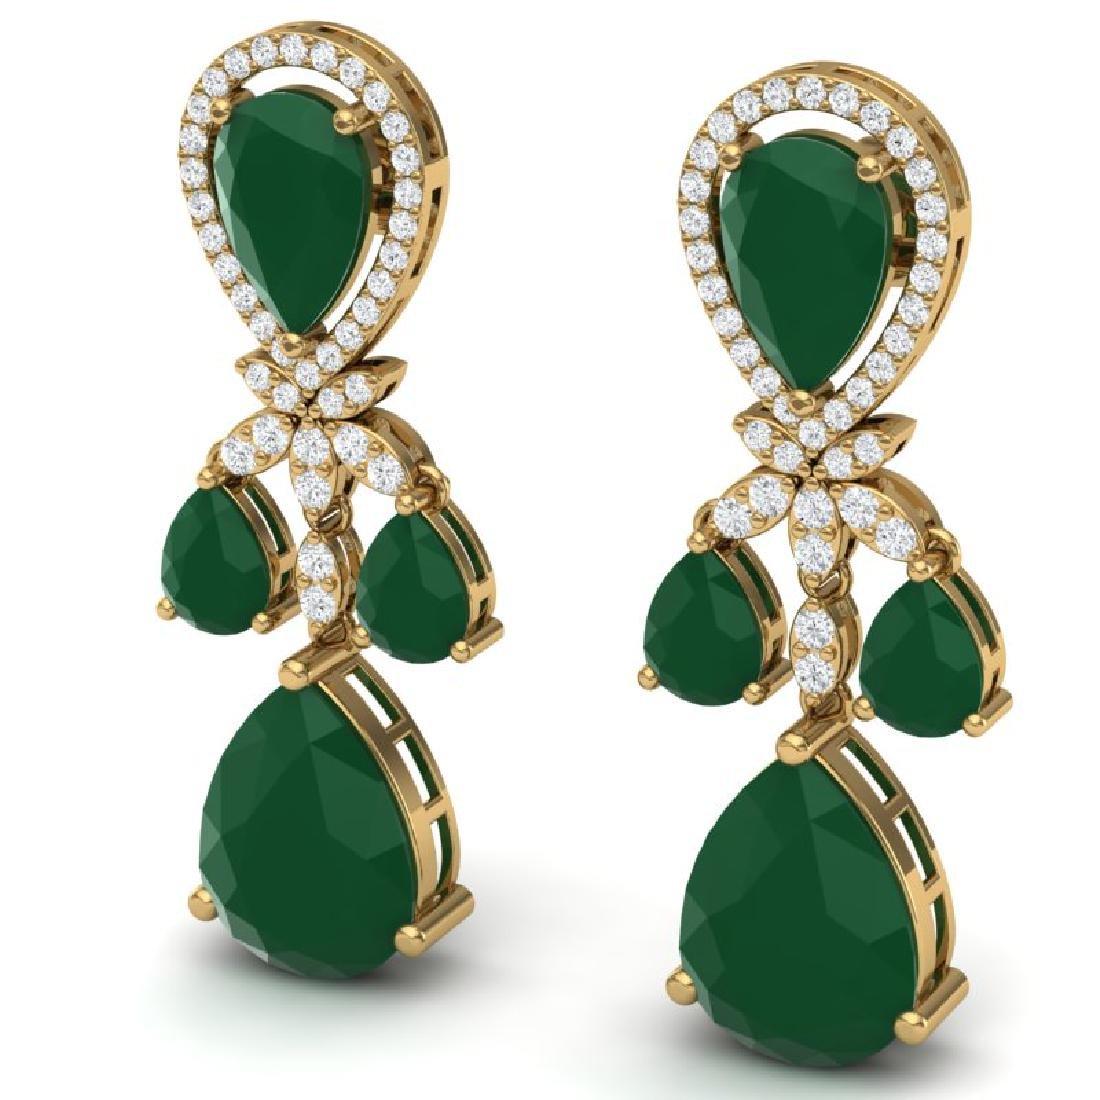 38.29 CTW Royalty Emerald & VS Diamond Earrings 18K - 2